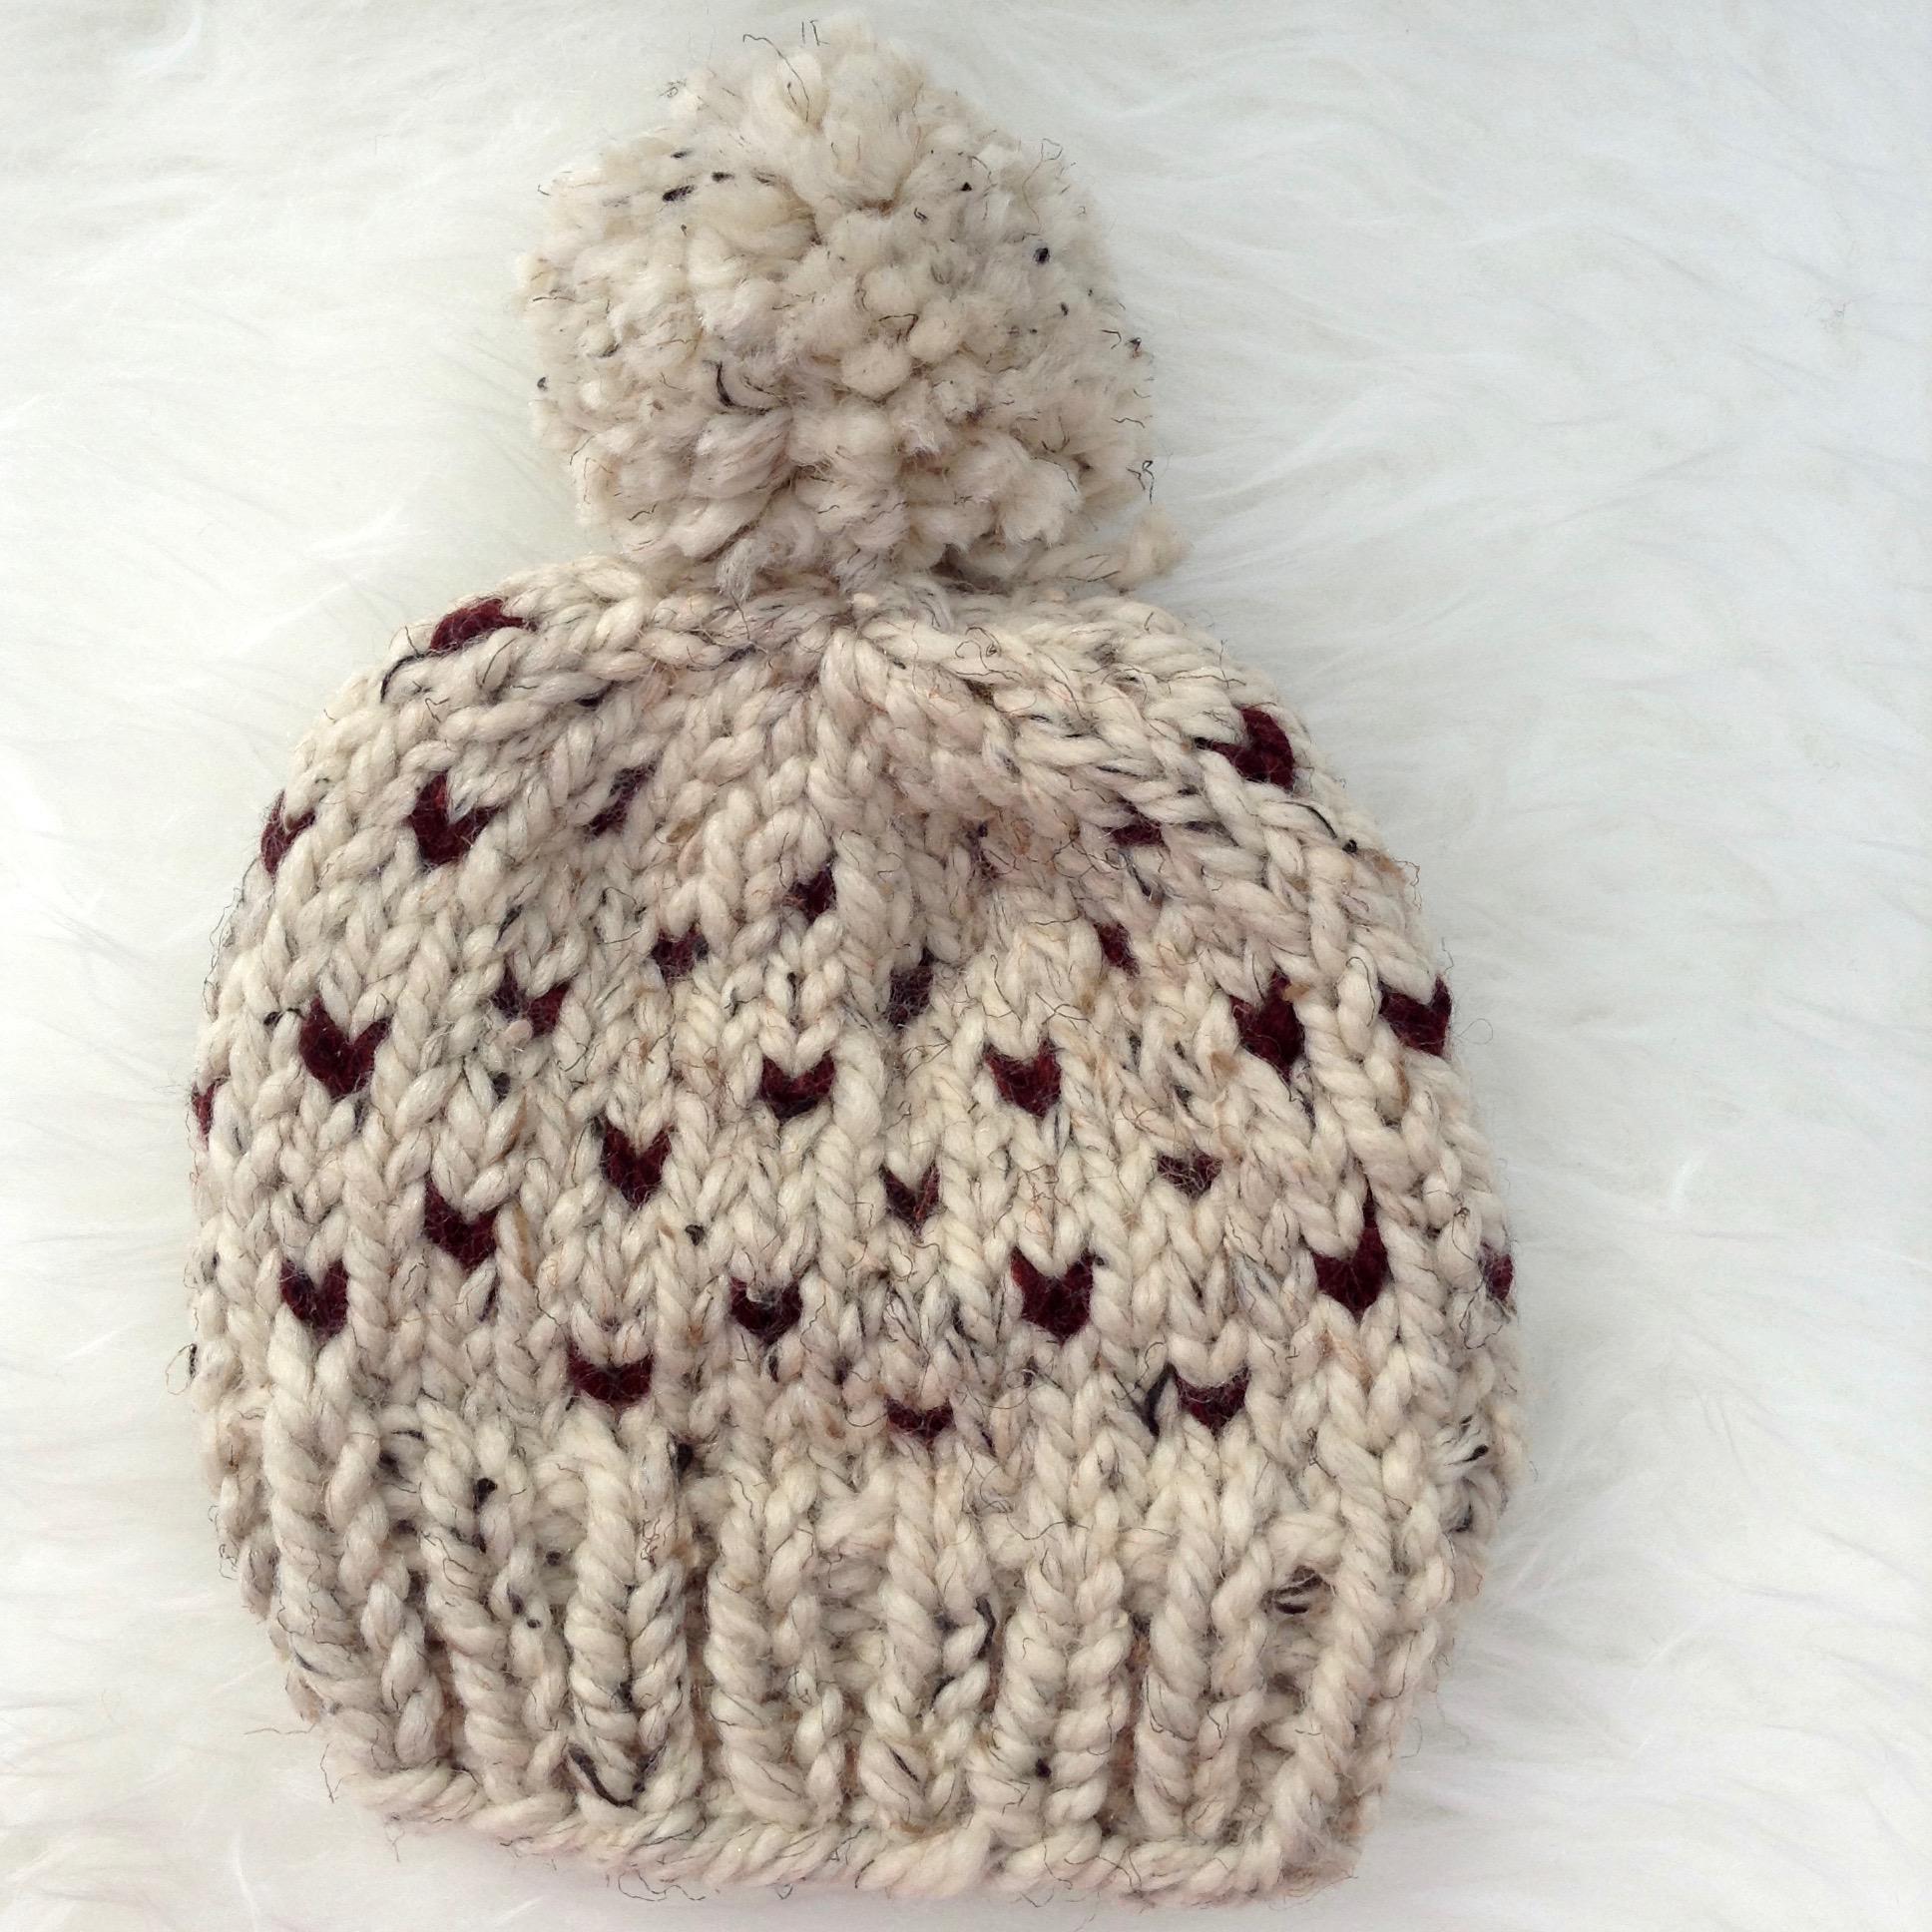 Oatmeal Raisin Cookie Baby Hat